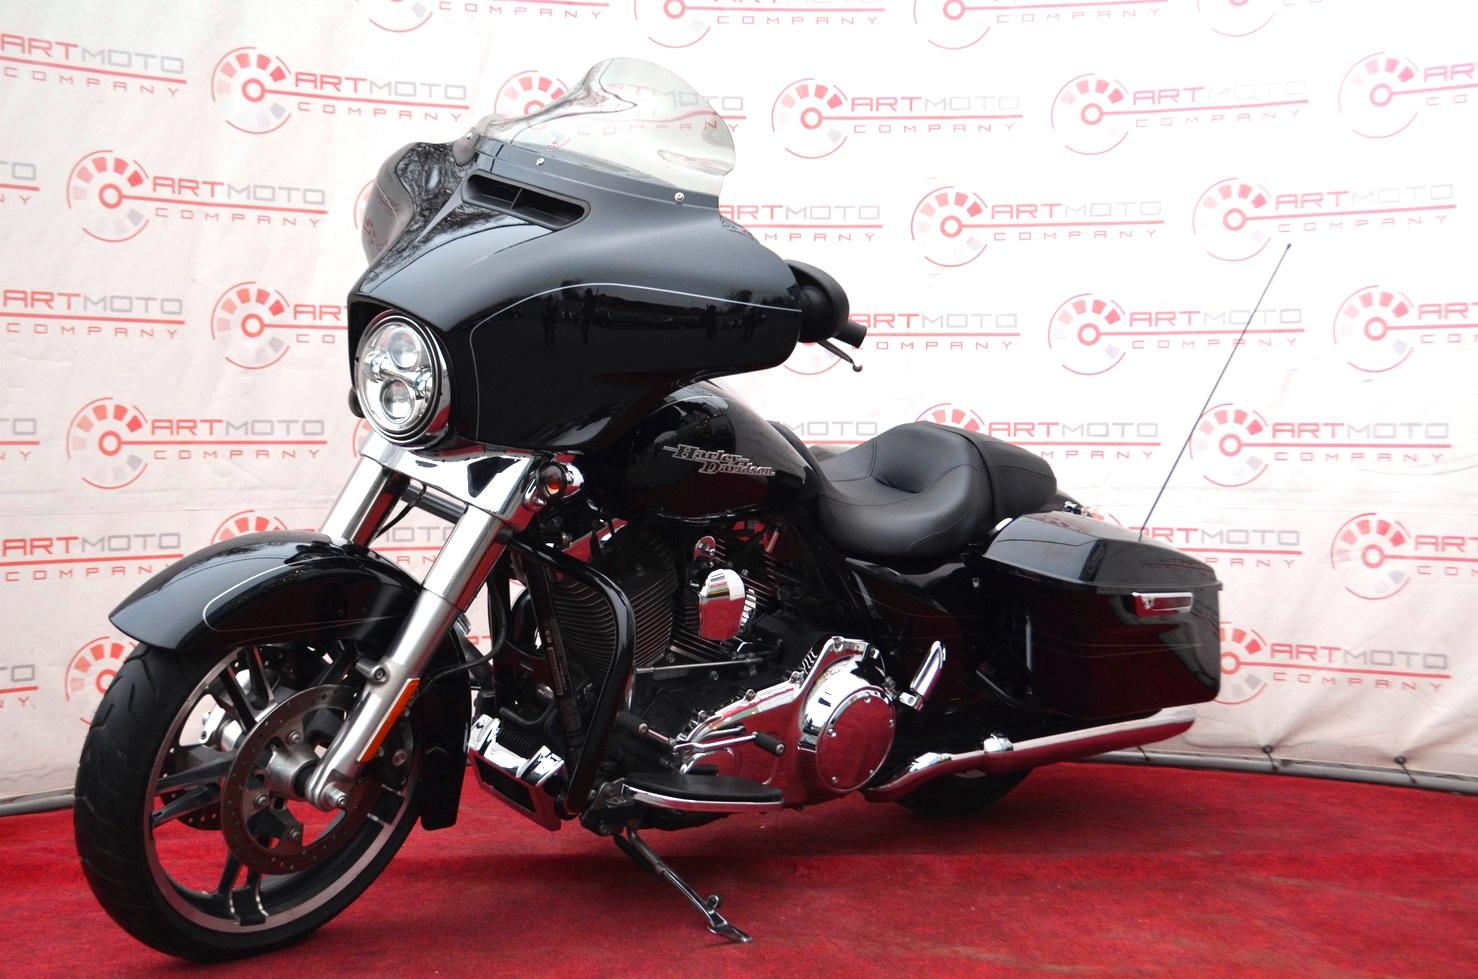 МОТОЦИКЛ HARLEY DAVIDSON FLHXS STREET GLIDE 2015 ― Артмото - купить квадроцикл в украине и харькове, мотоцикл, снегоход, скутер, мопед, электромобиль